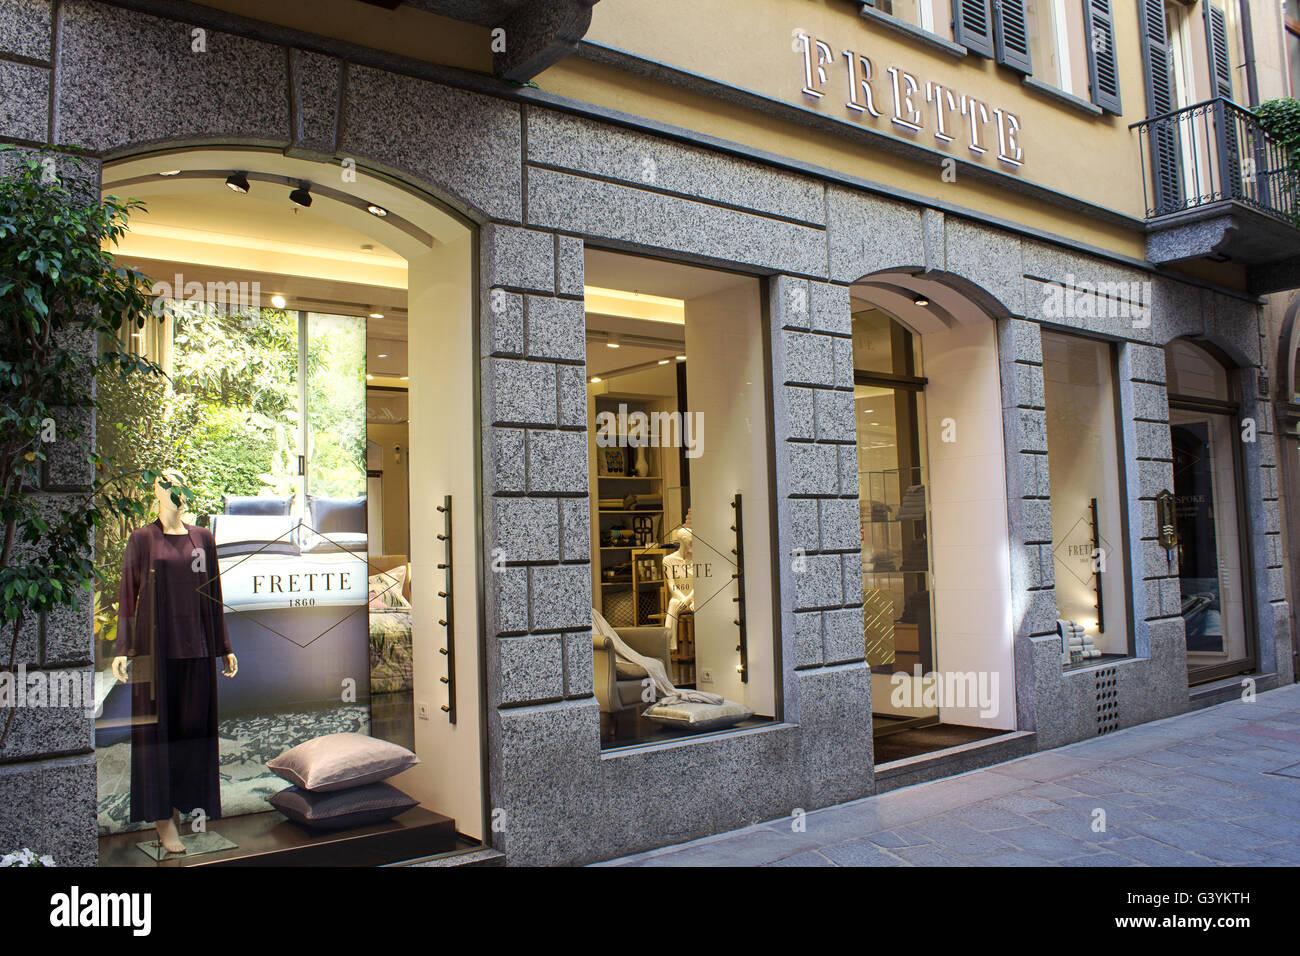 Frette high fashion and home design shopping windows in for Fashion designer milano